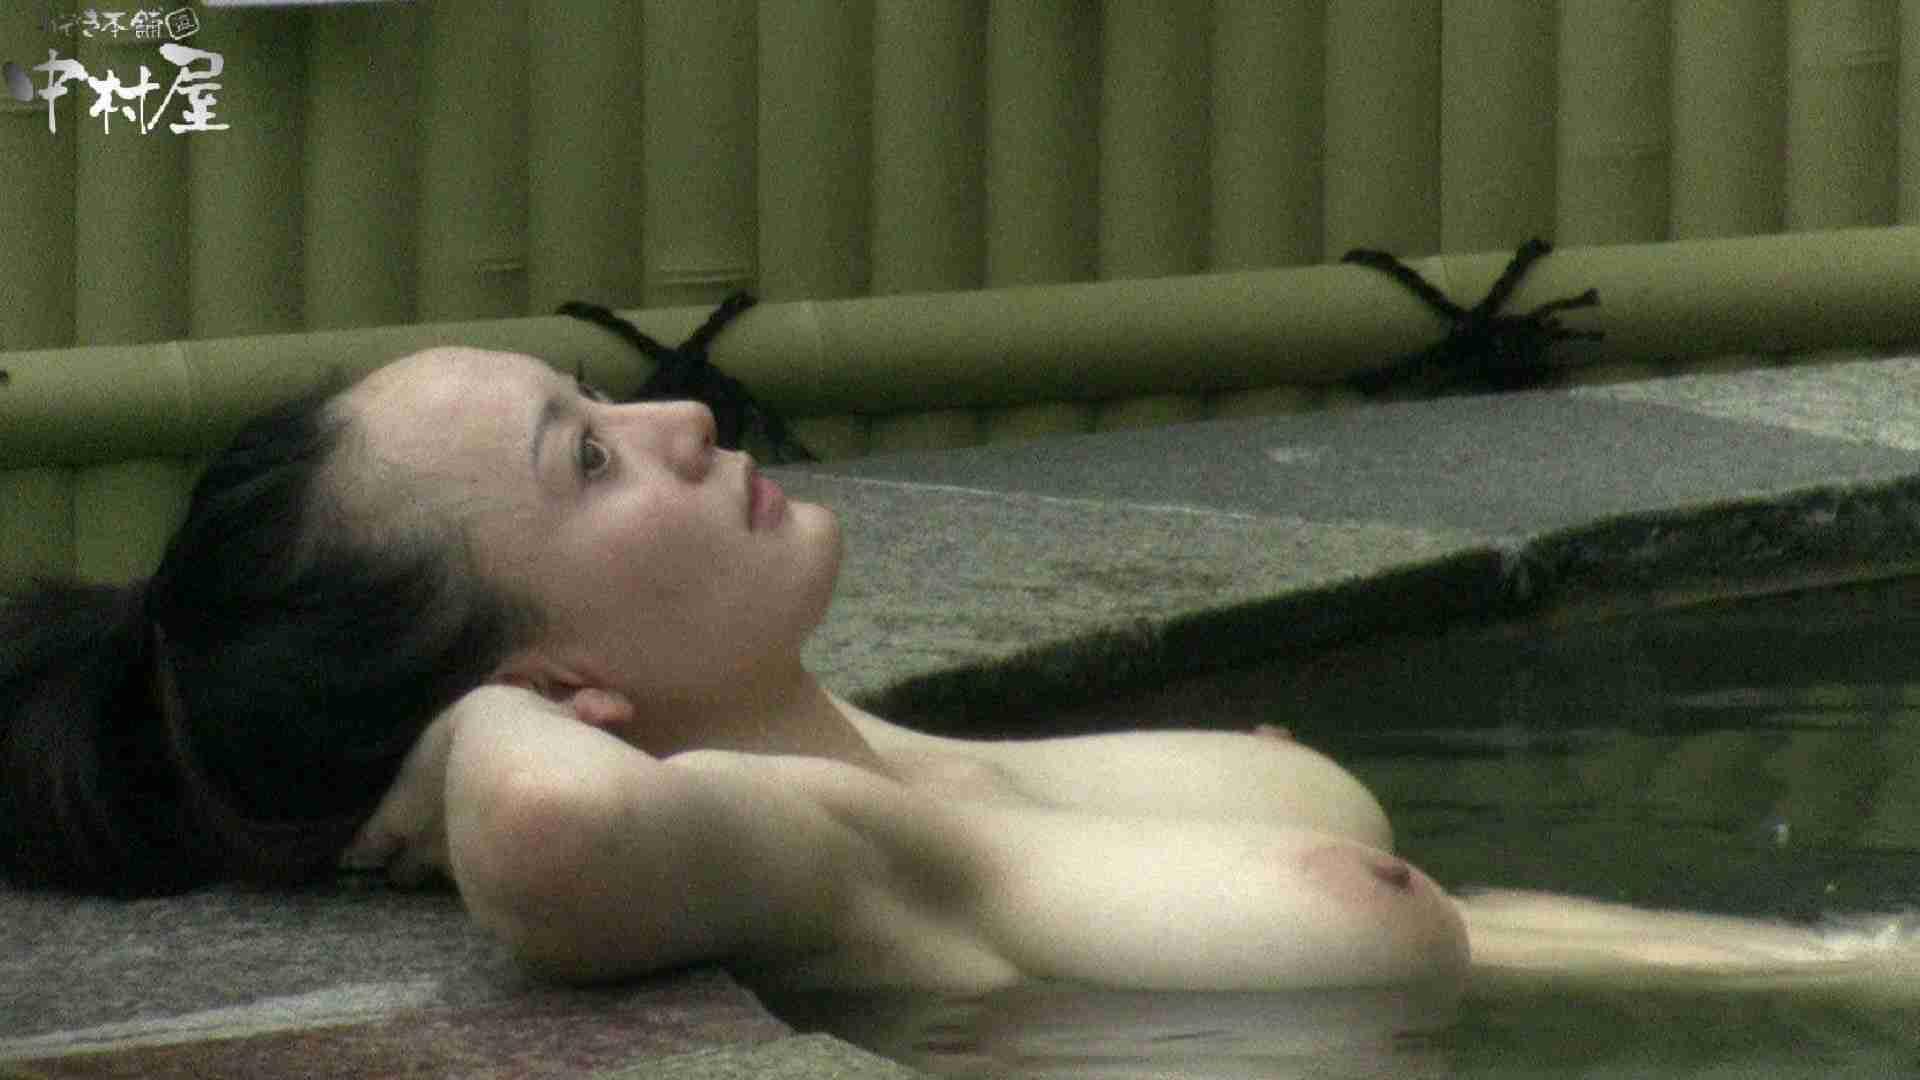 Aquaな露天風呂Vol.900 盗撮シリーズ | 露天風呂編  110PIX 107